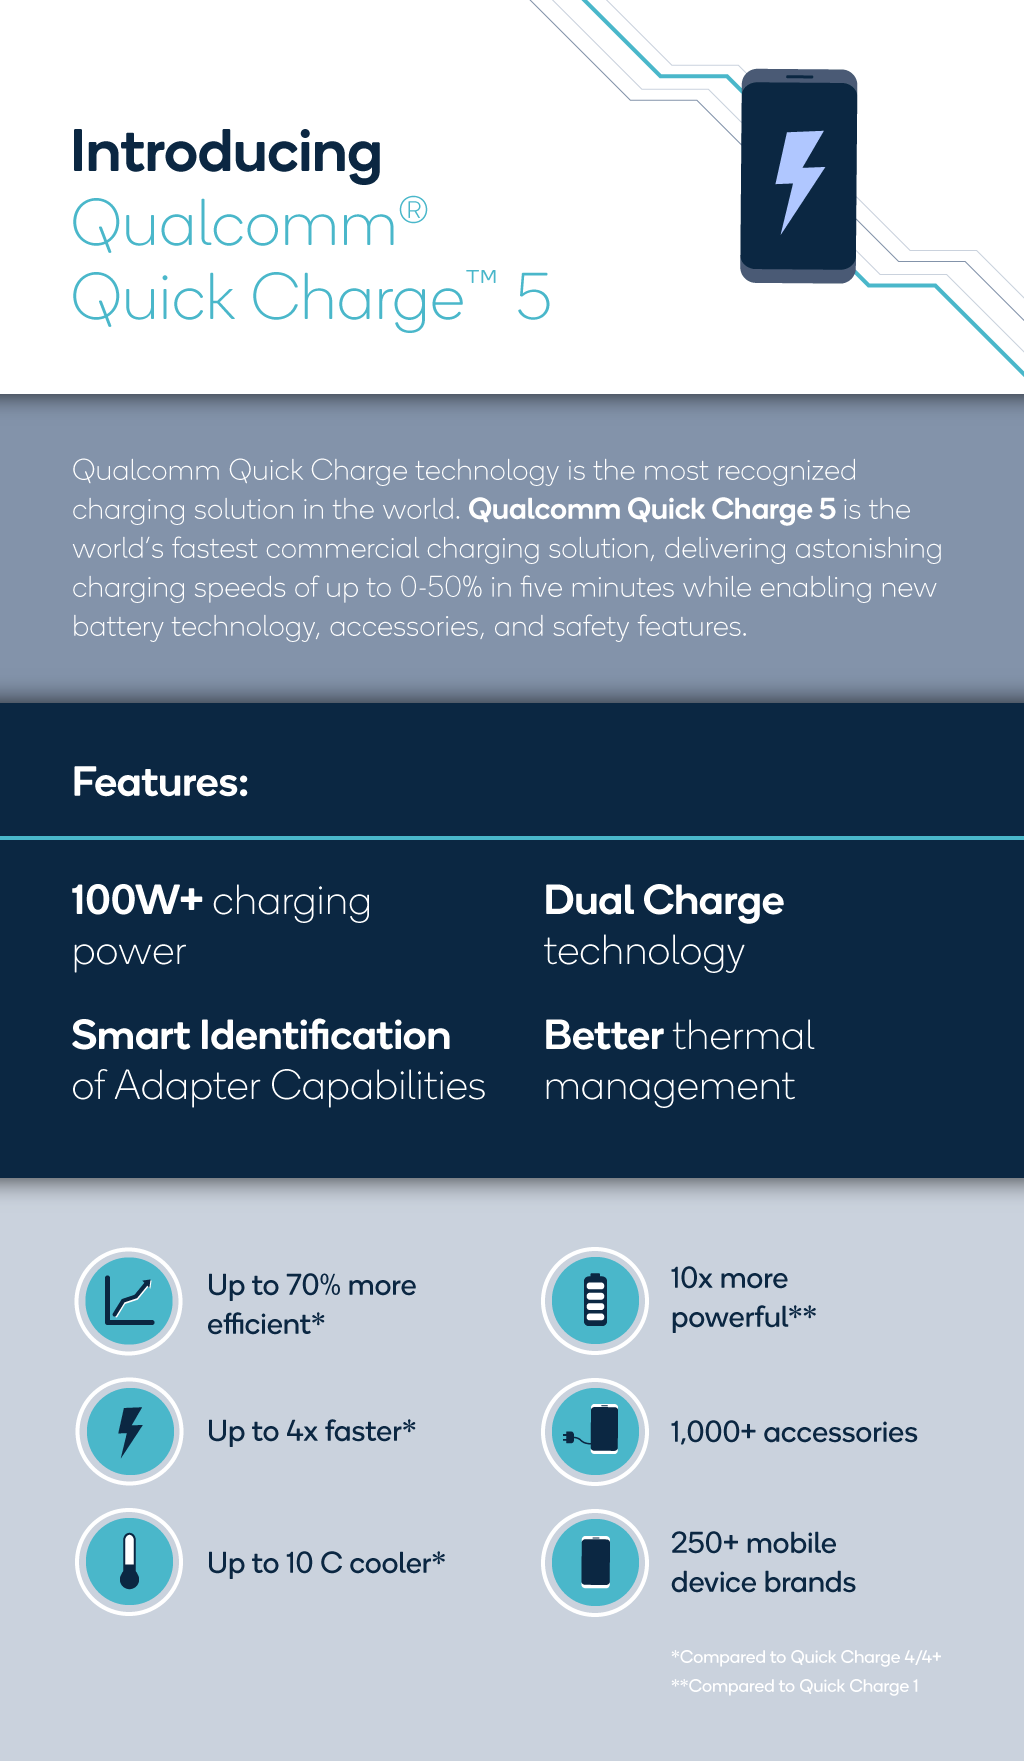 Qualcomm Quick Charge 5 Infographic